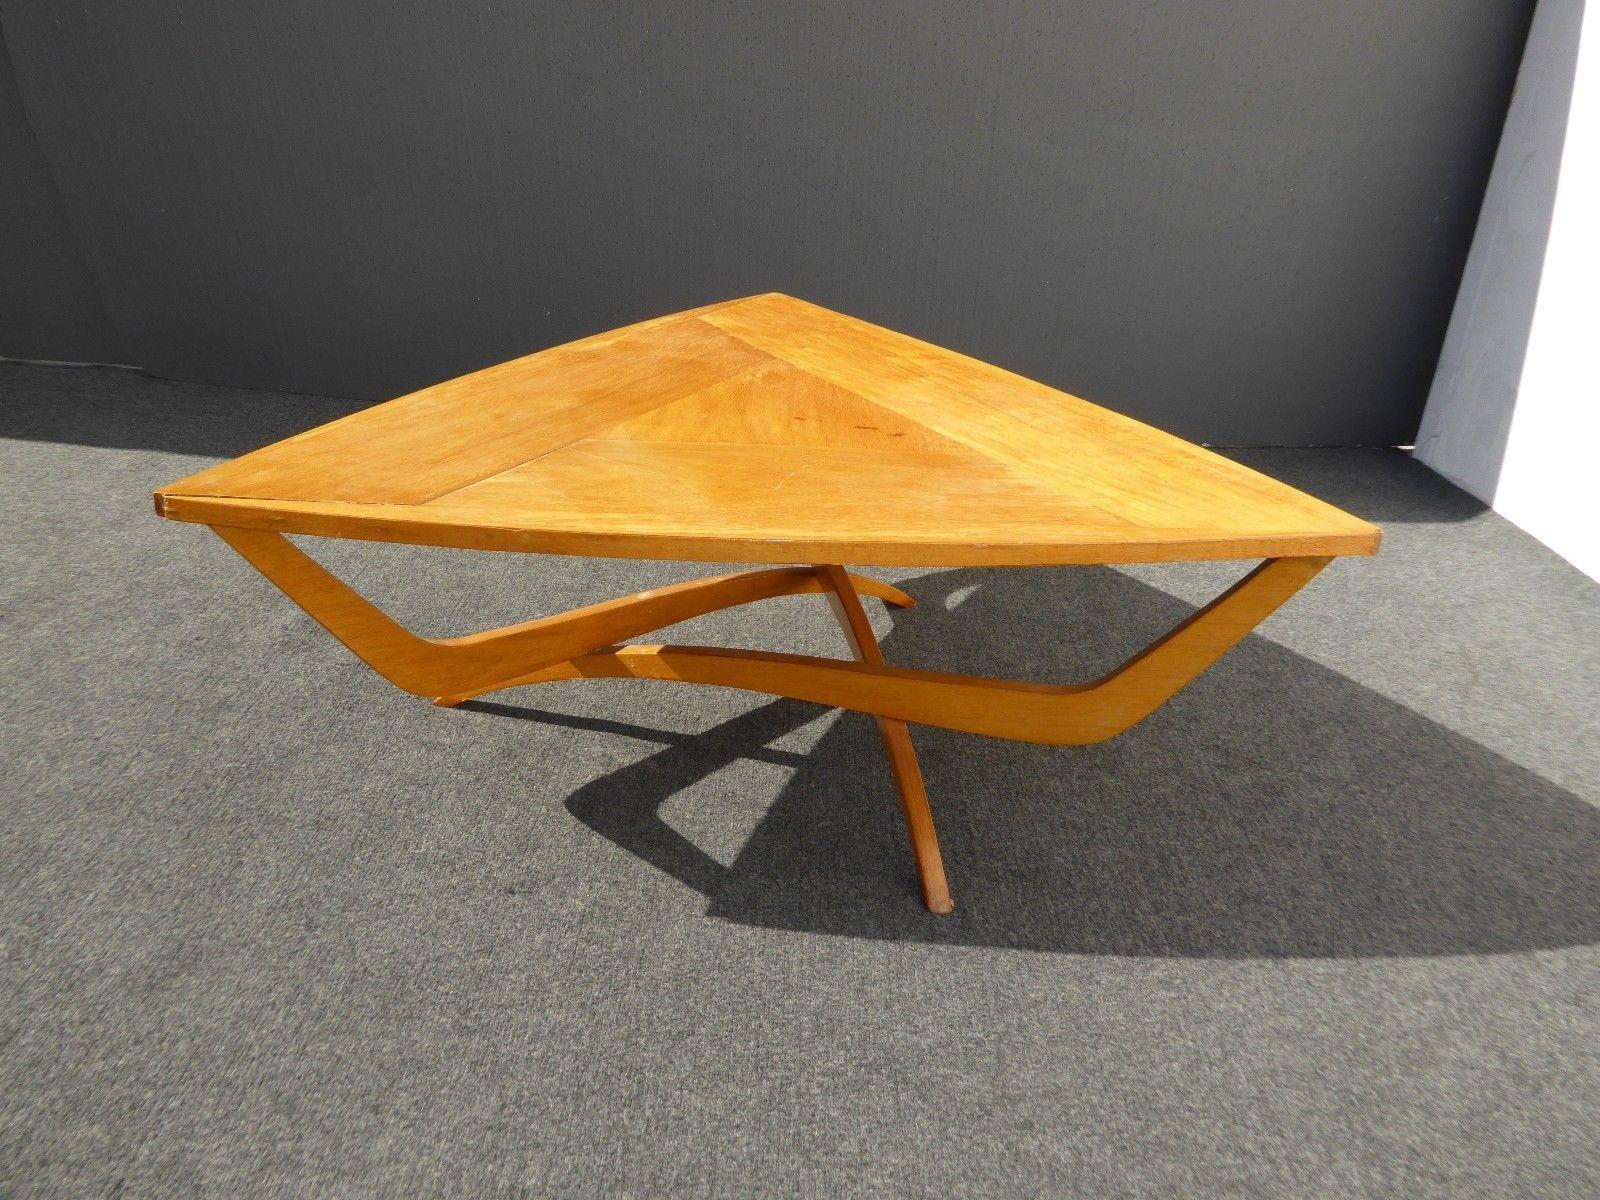 Unique Vintage Danish Modern Art Deco Style Solid Wood Triangle